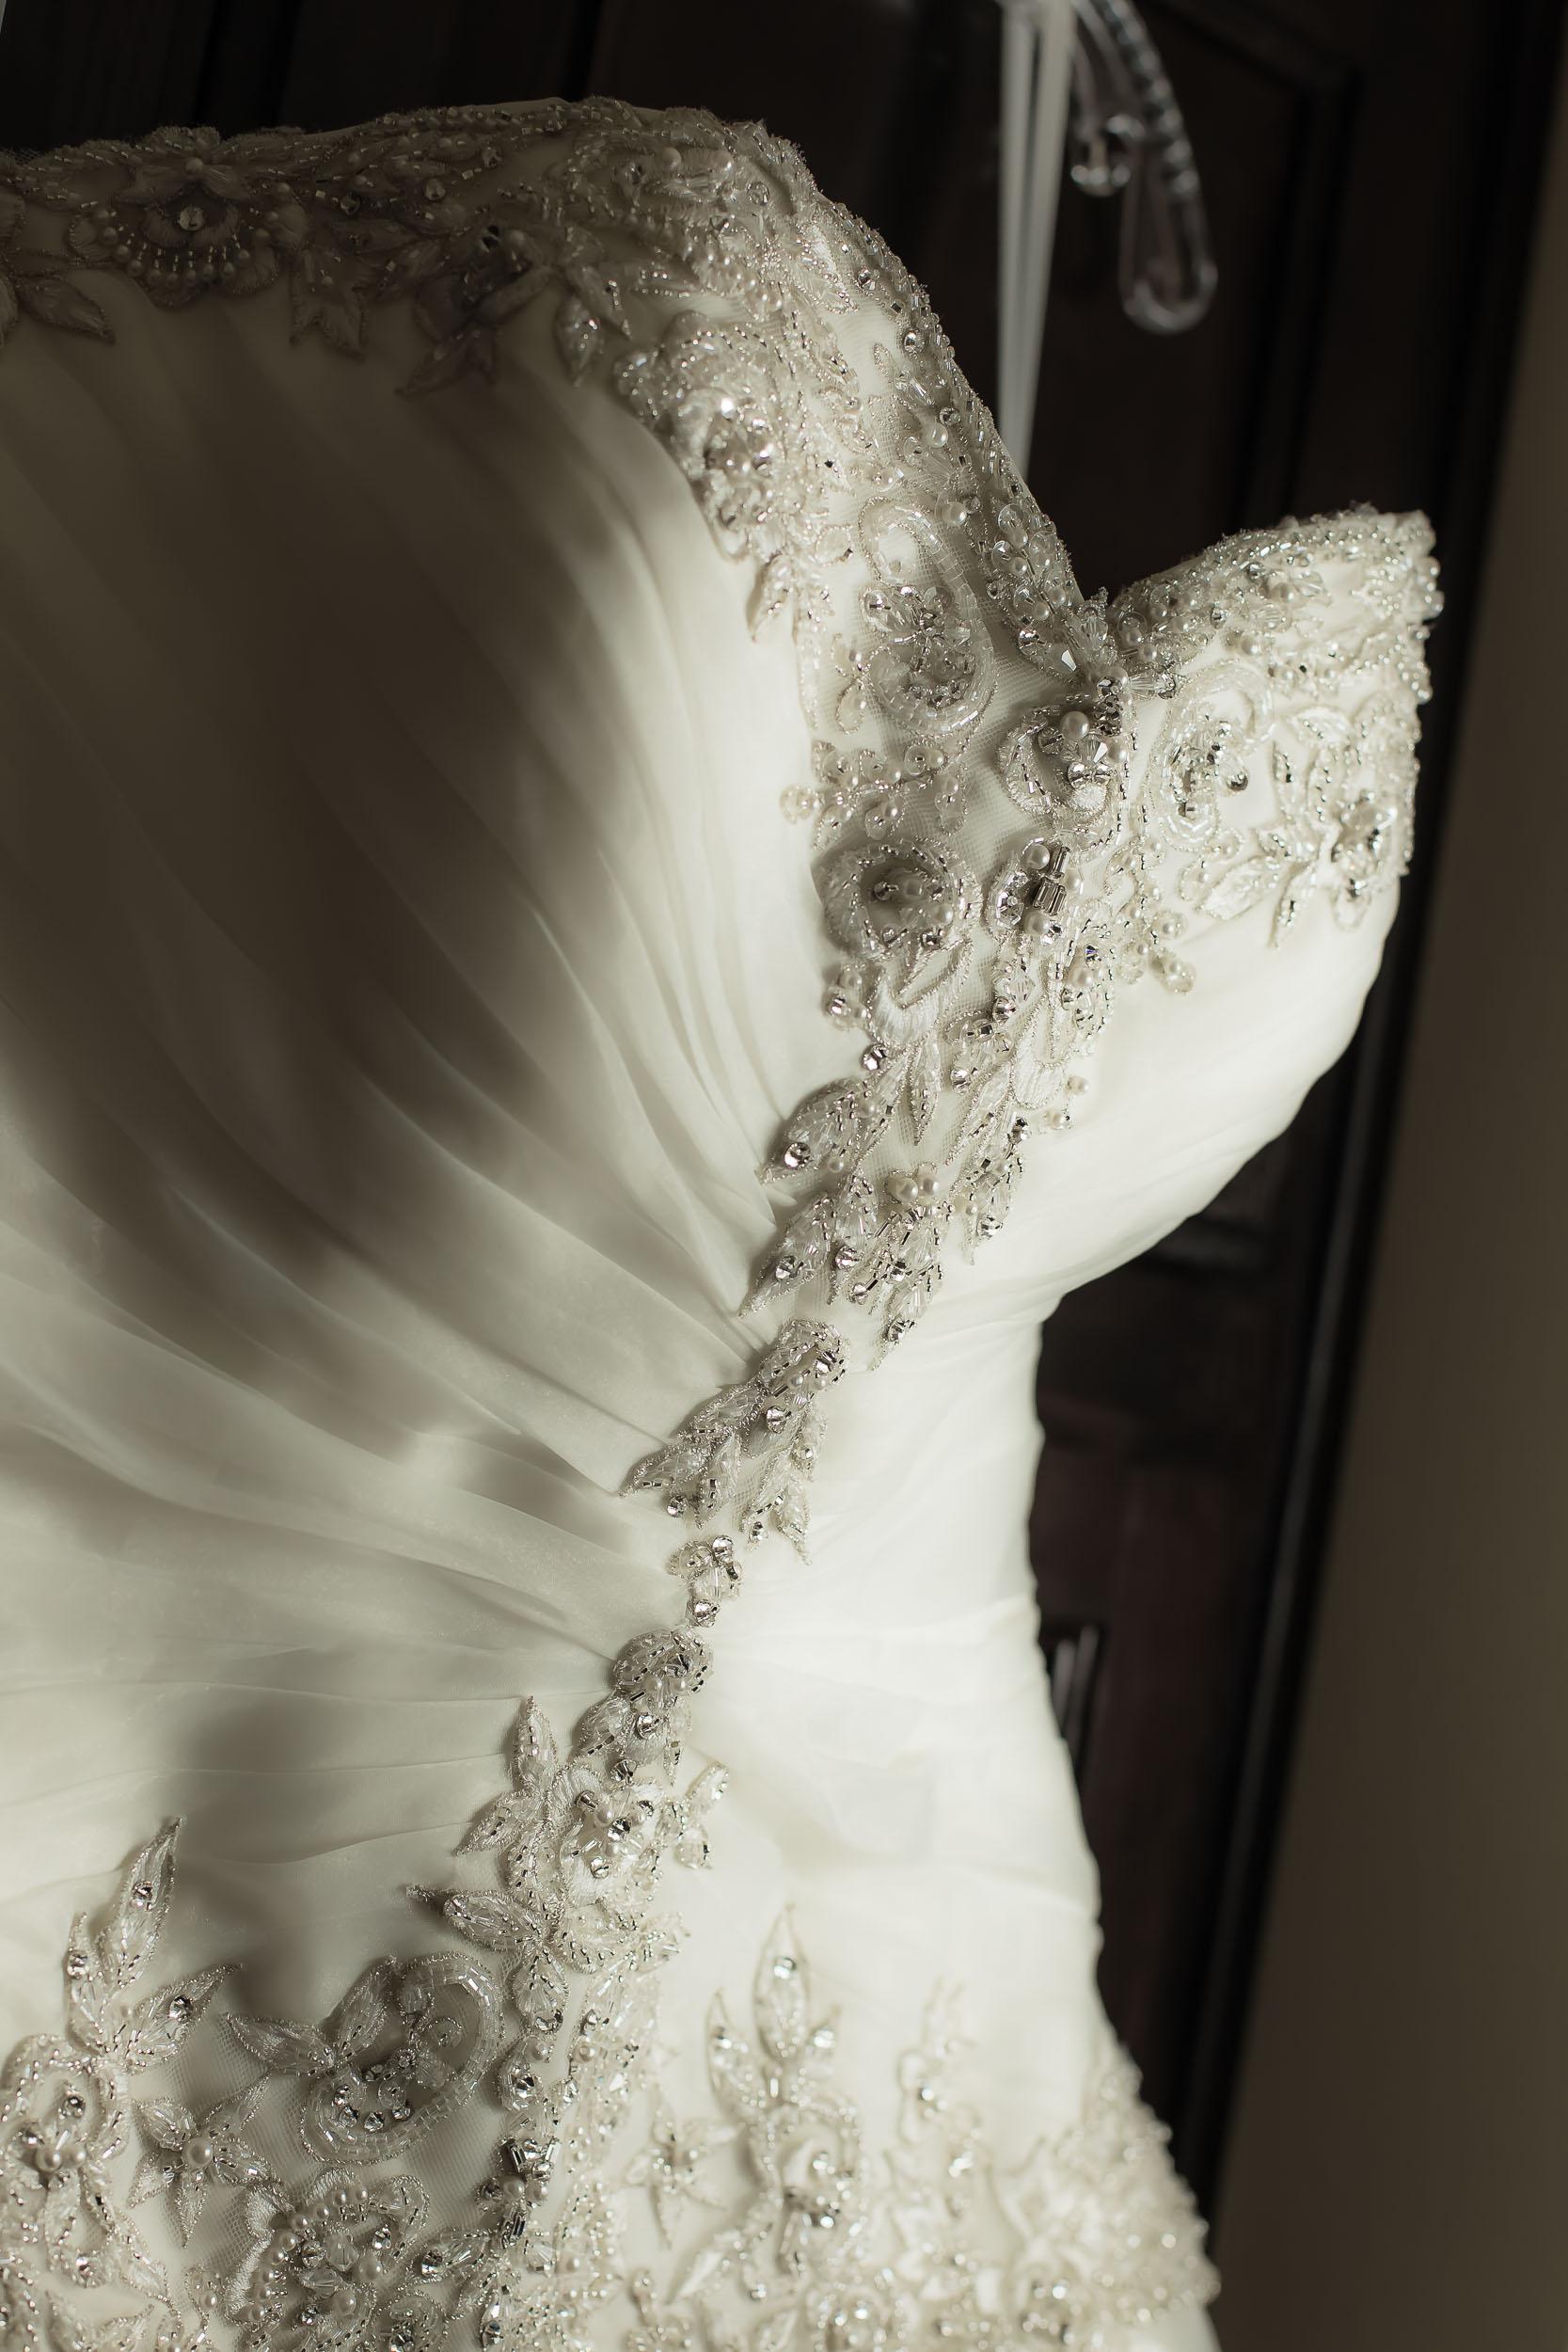 portrait of a wedding dress